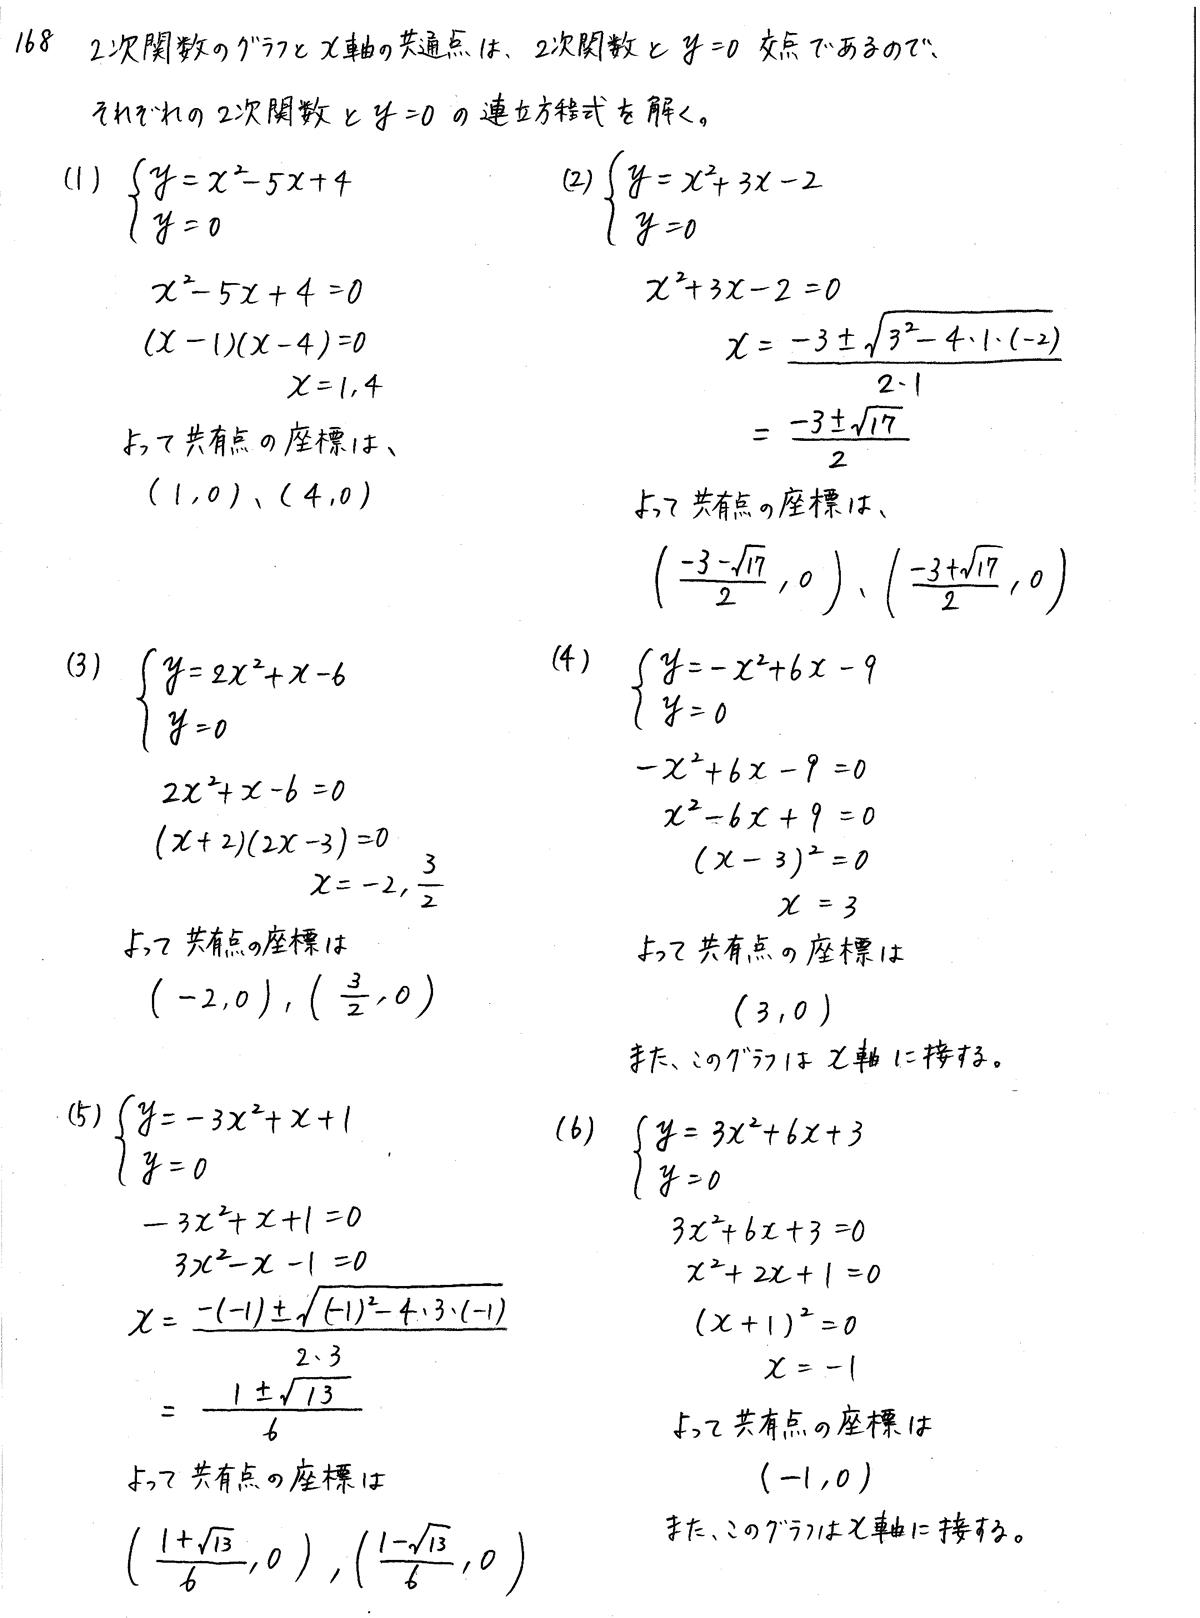 3TRIAL数学1-168解答